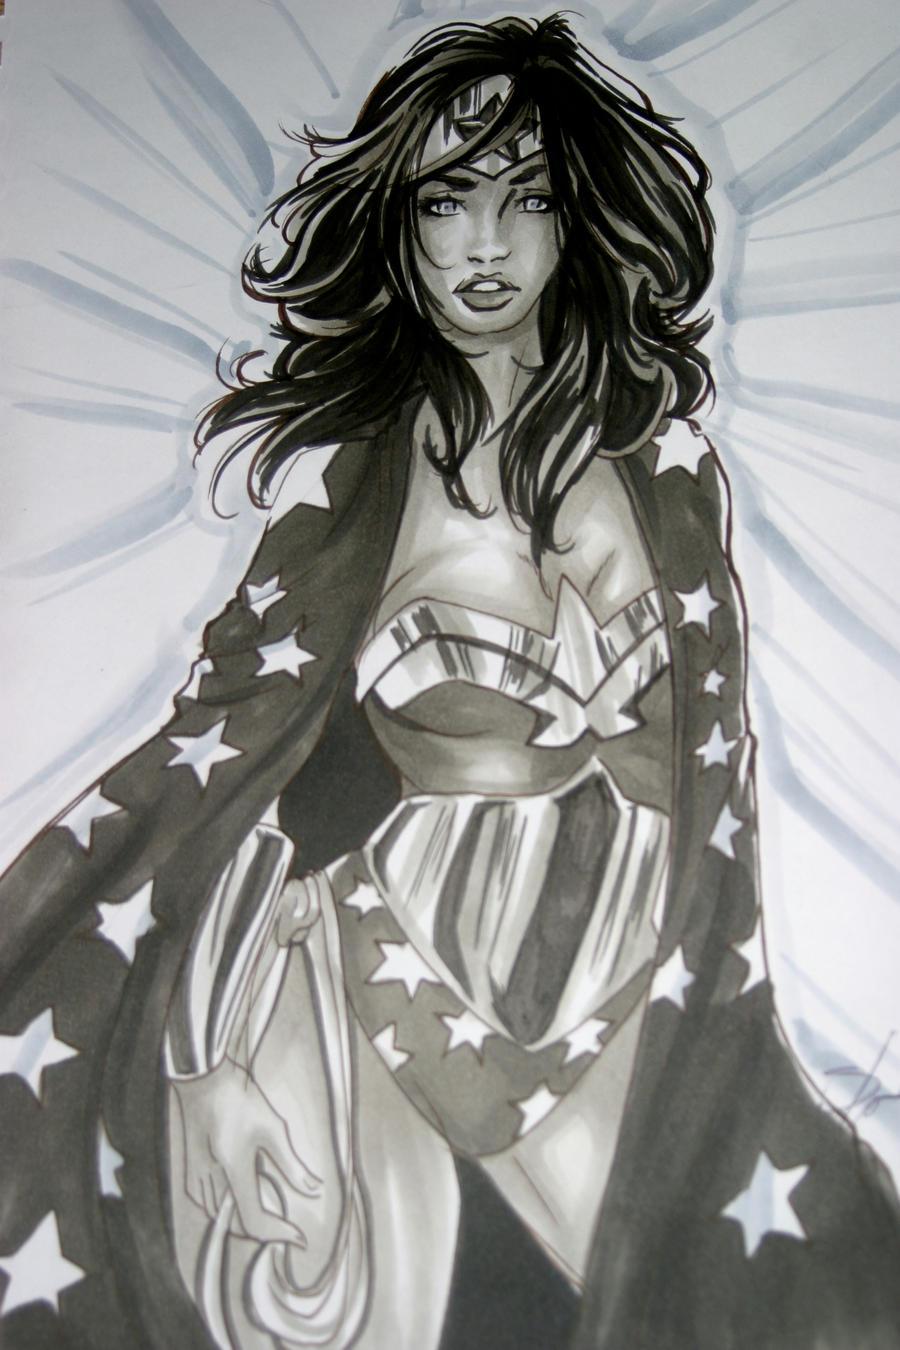 Wonder Woman by Kachumi